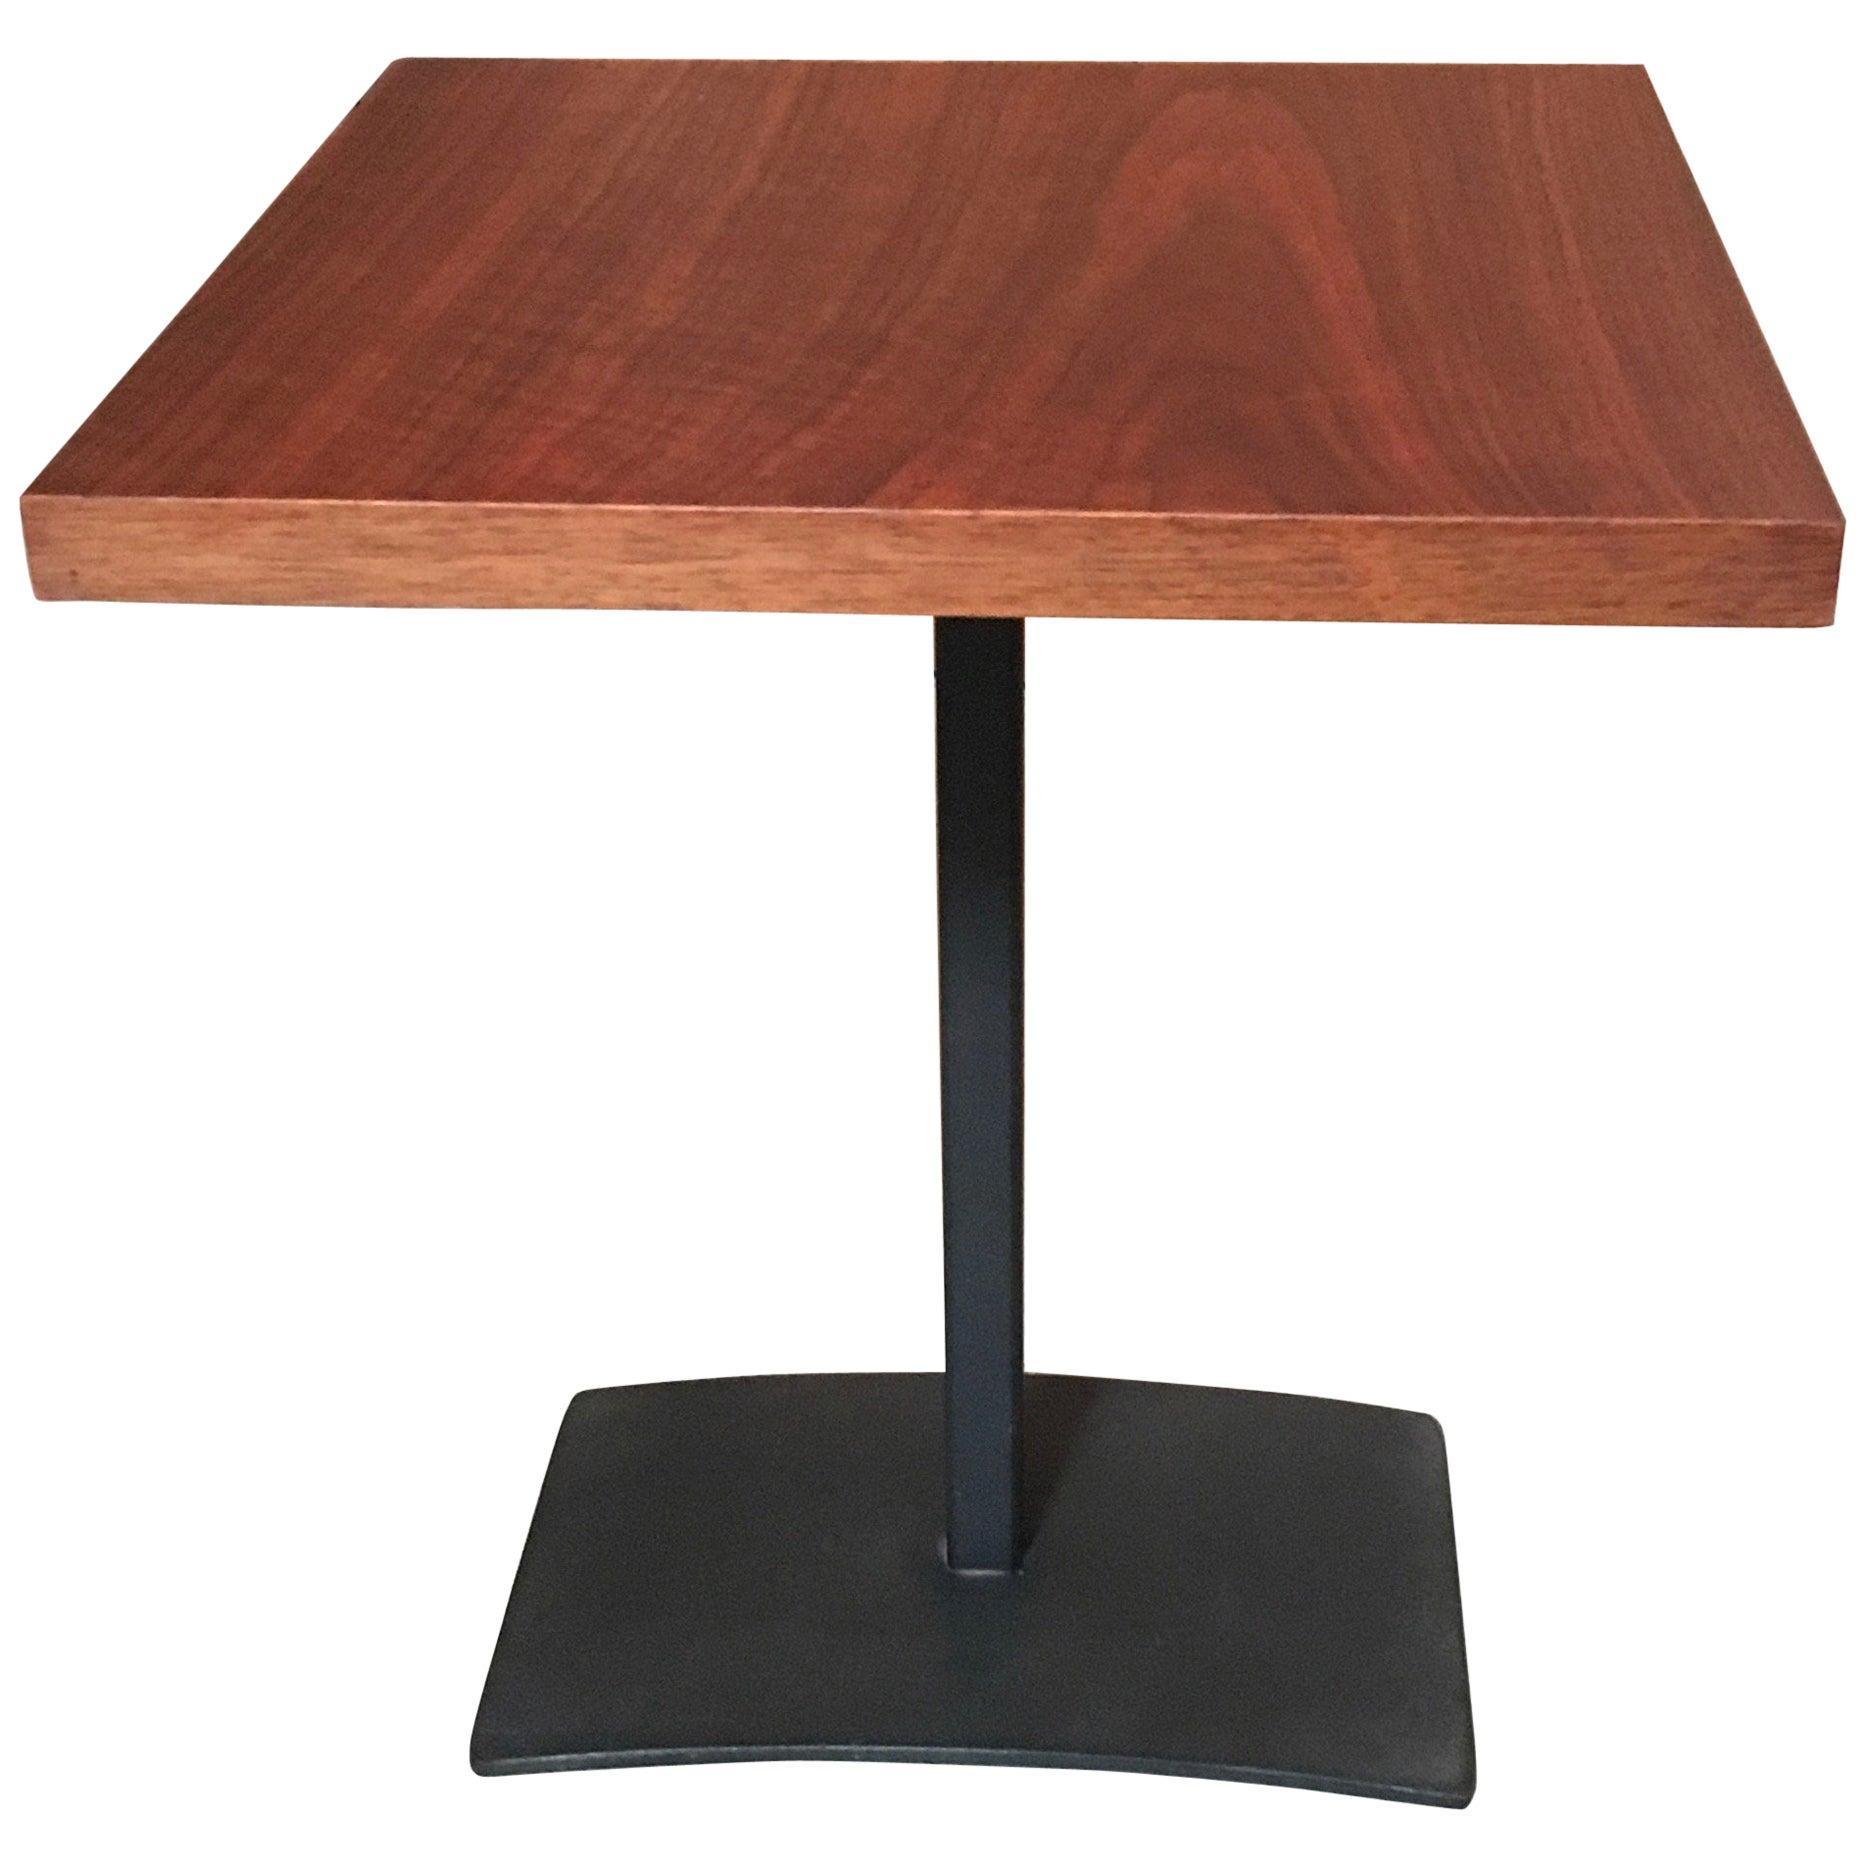 Walnut and Steel Milo Baughman Side Table